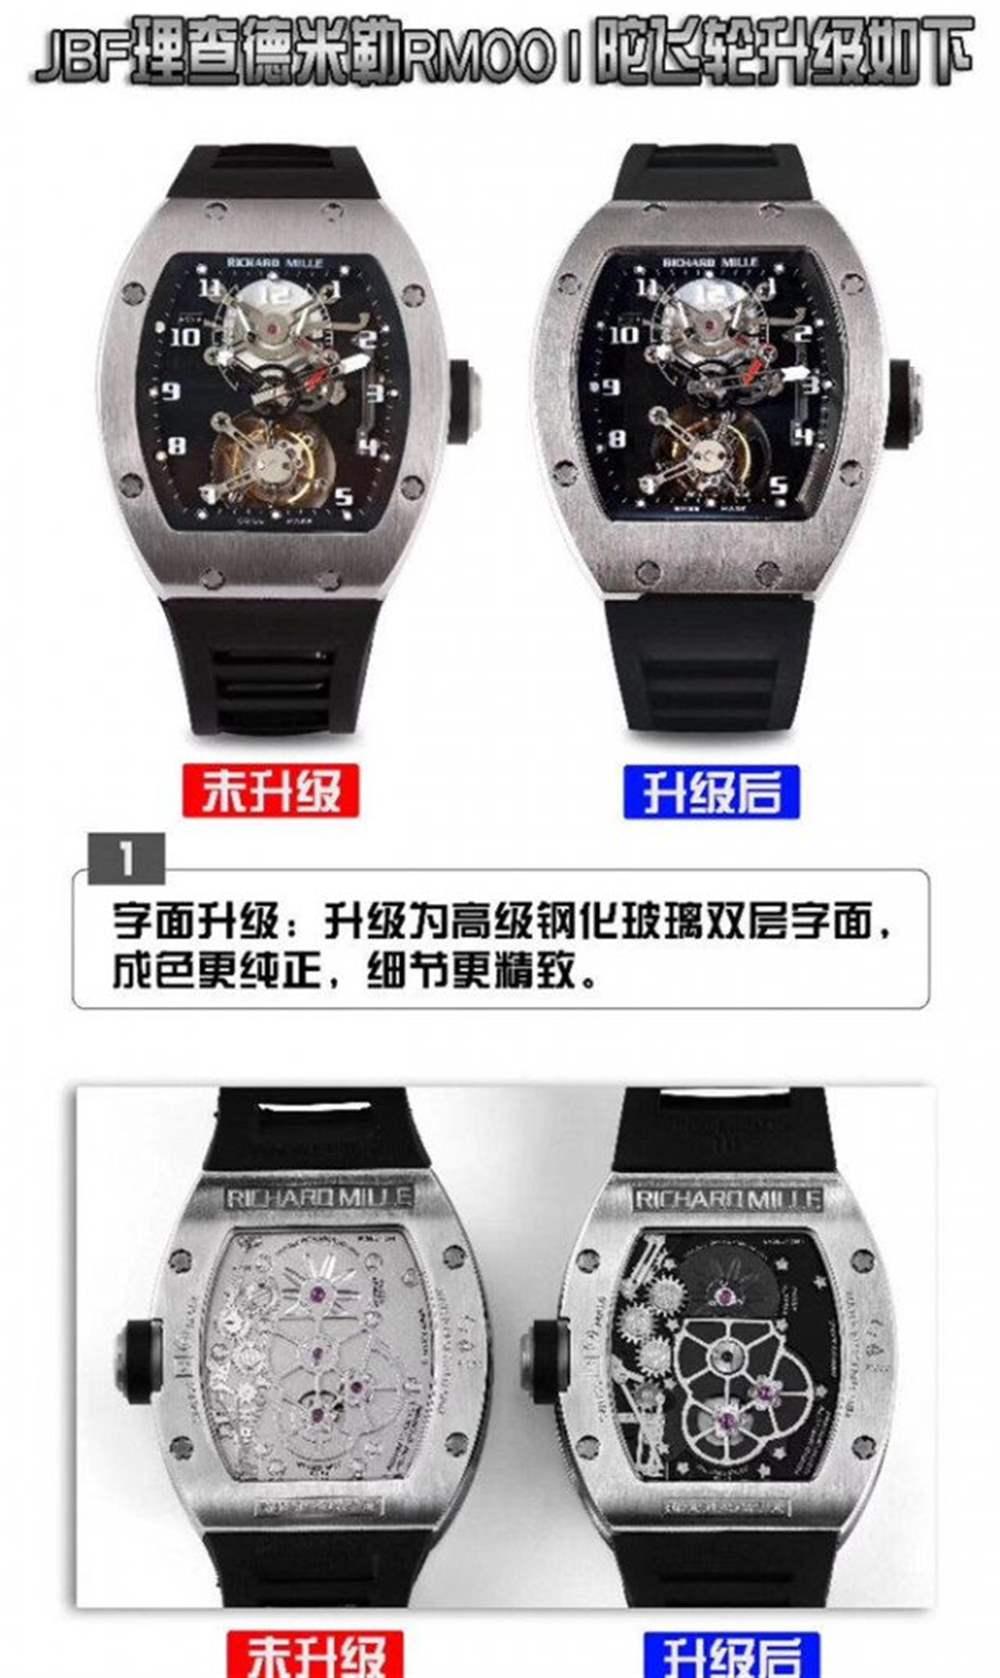 JB厂罗杰杜彼RM001真陀飞轮腕表升级解读